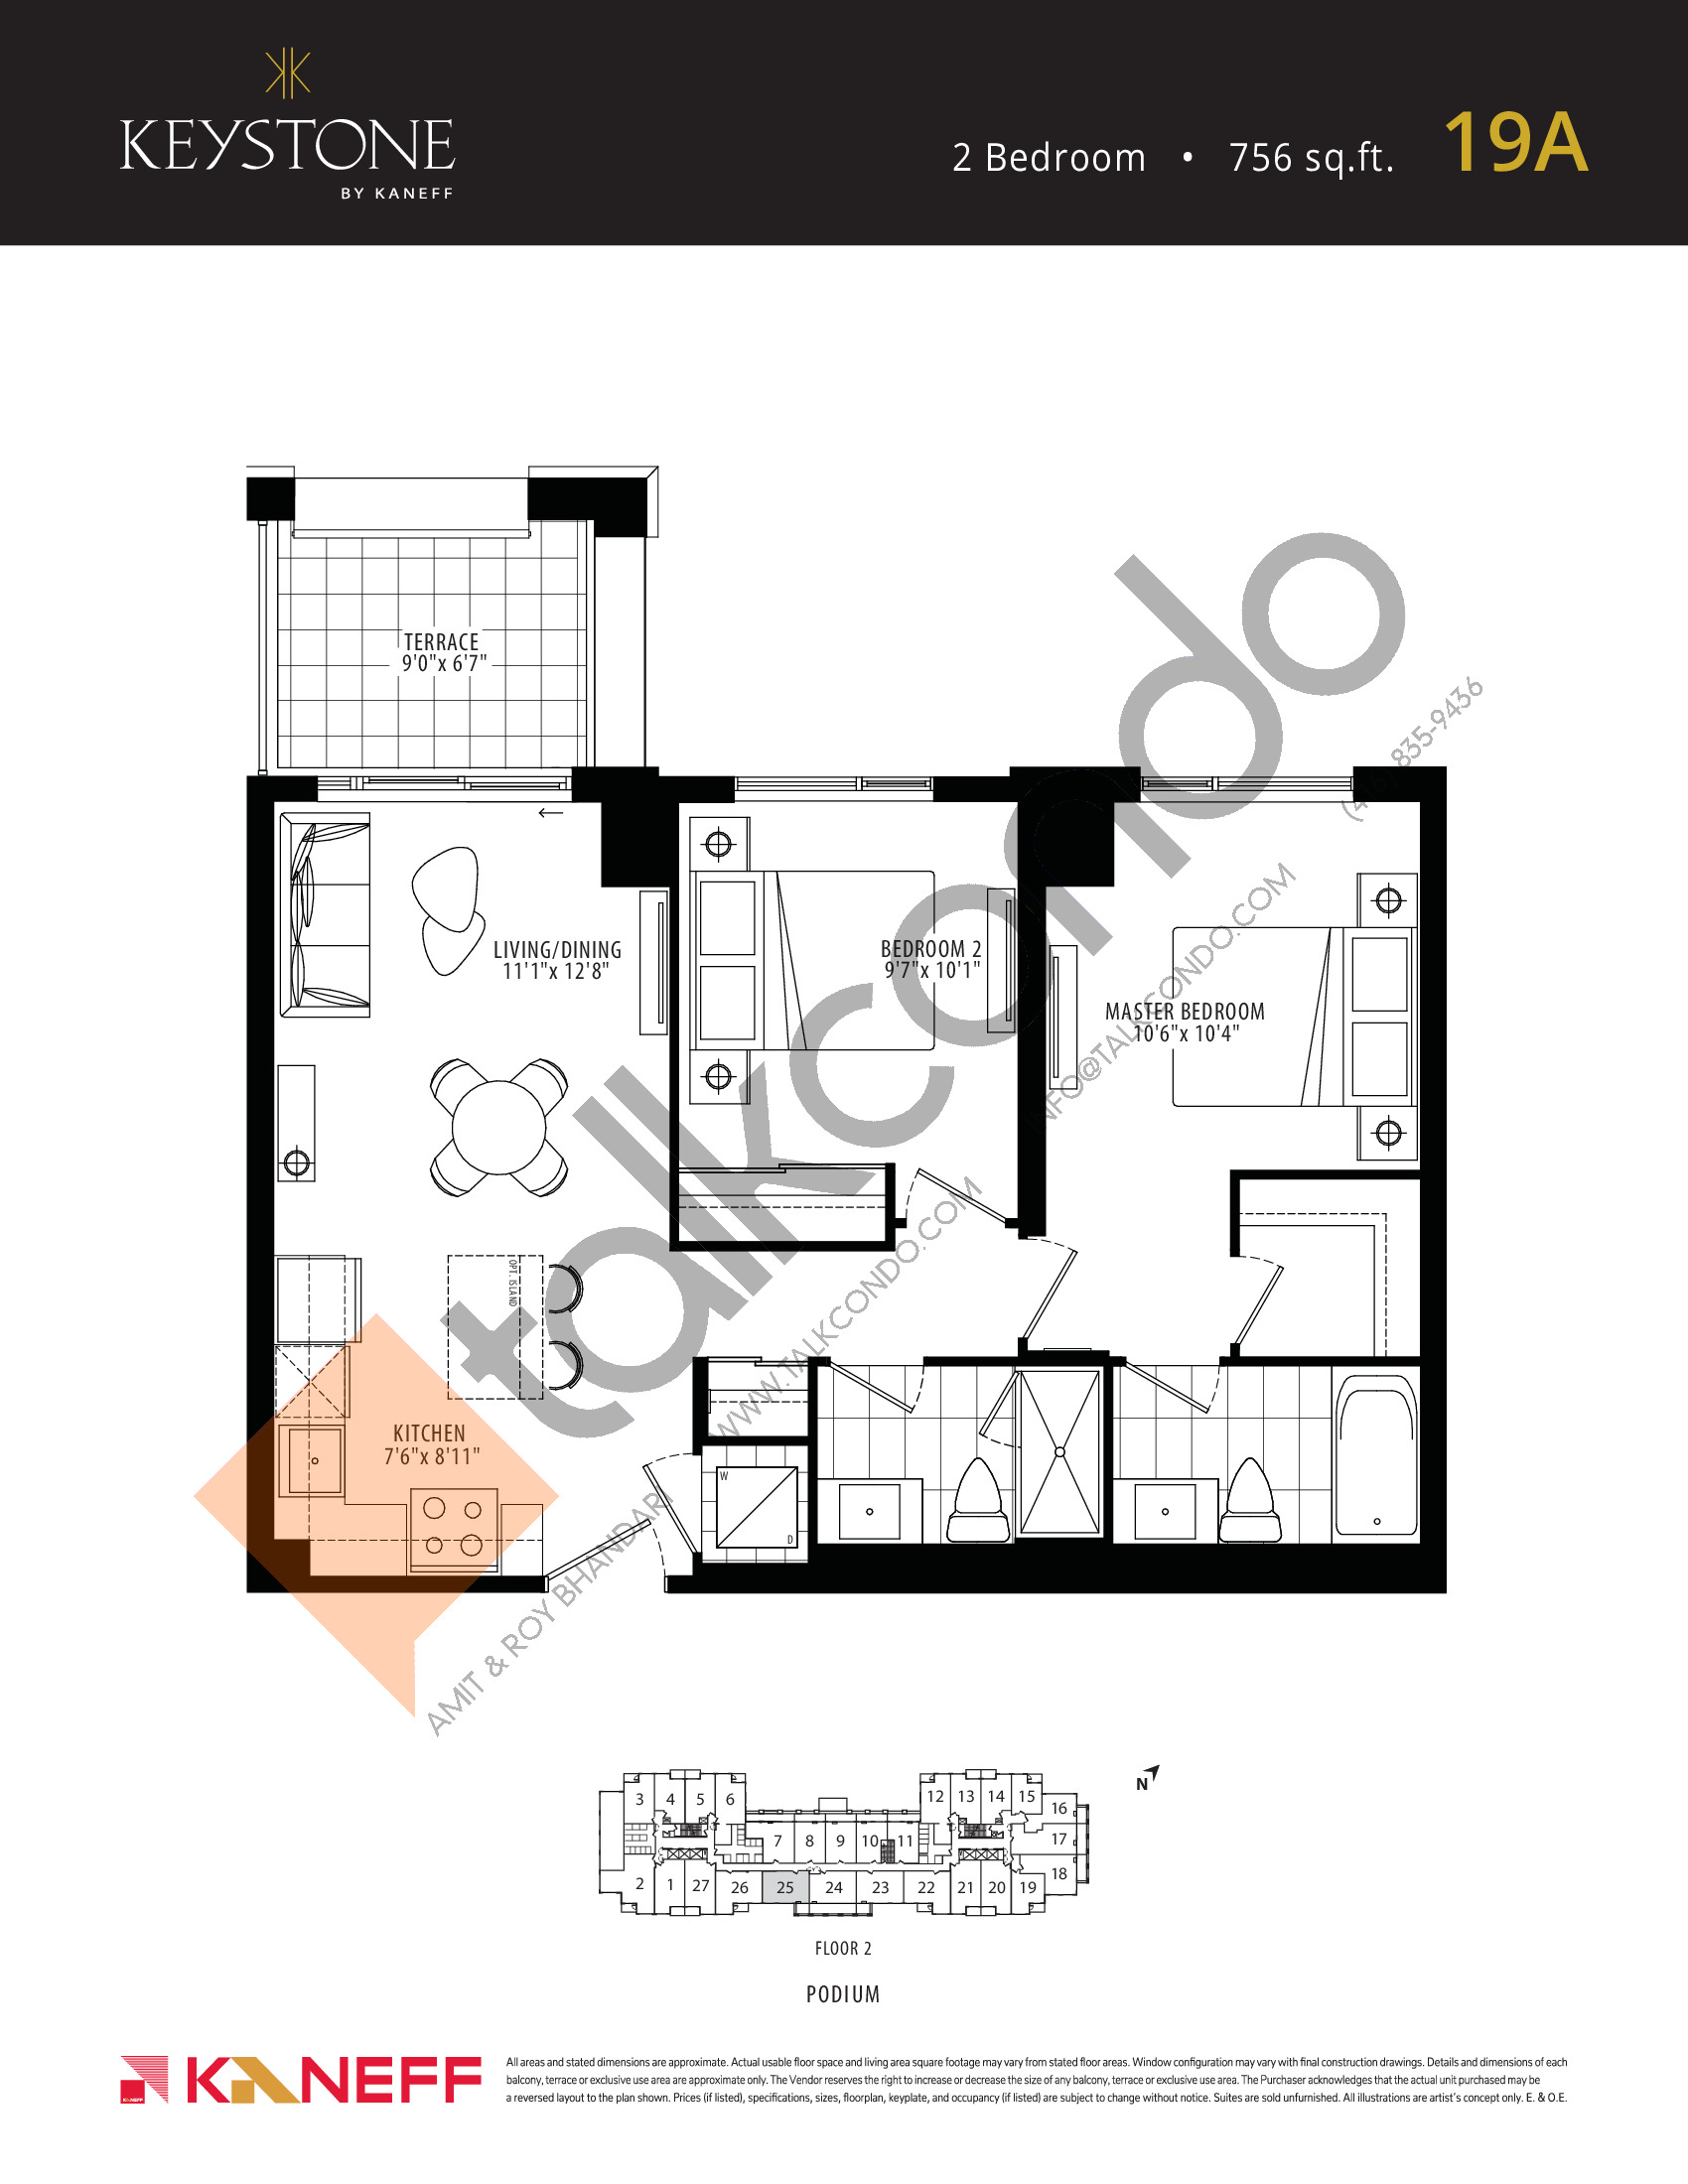 19A Floor Plan at Keystone Condos Phase 2 - 756 sq.ft